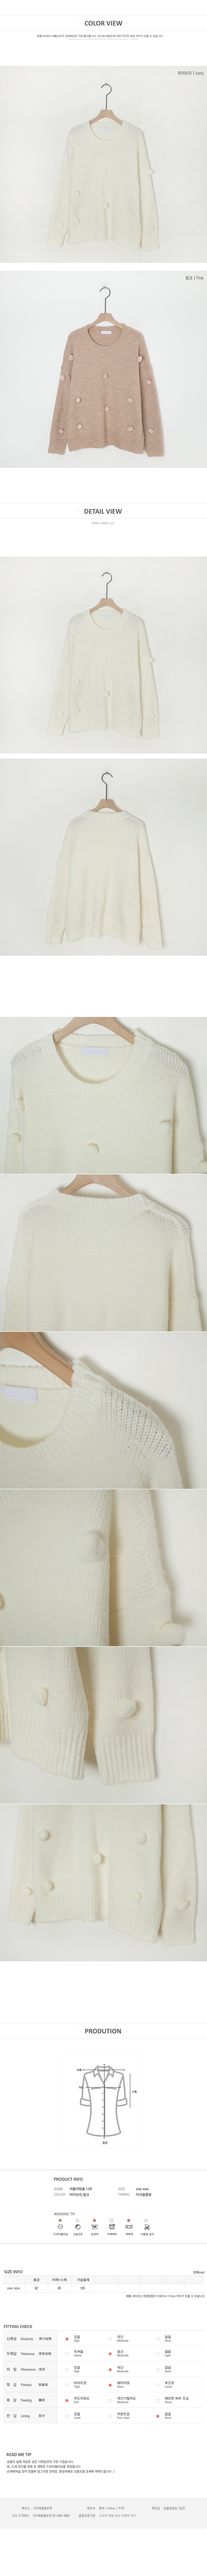 Lovely drop knit